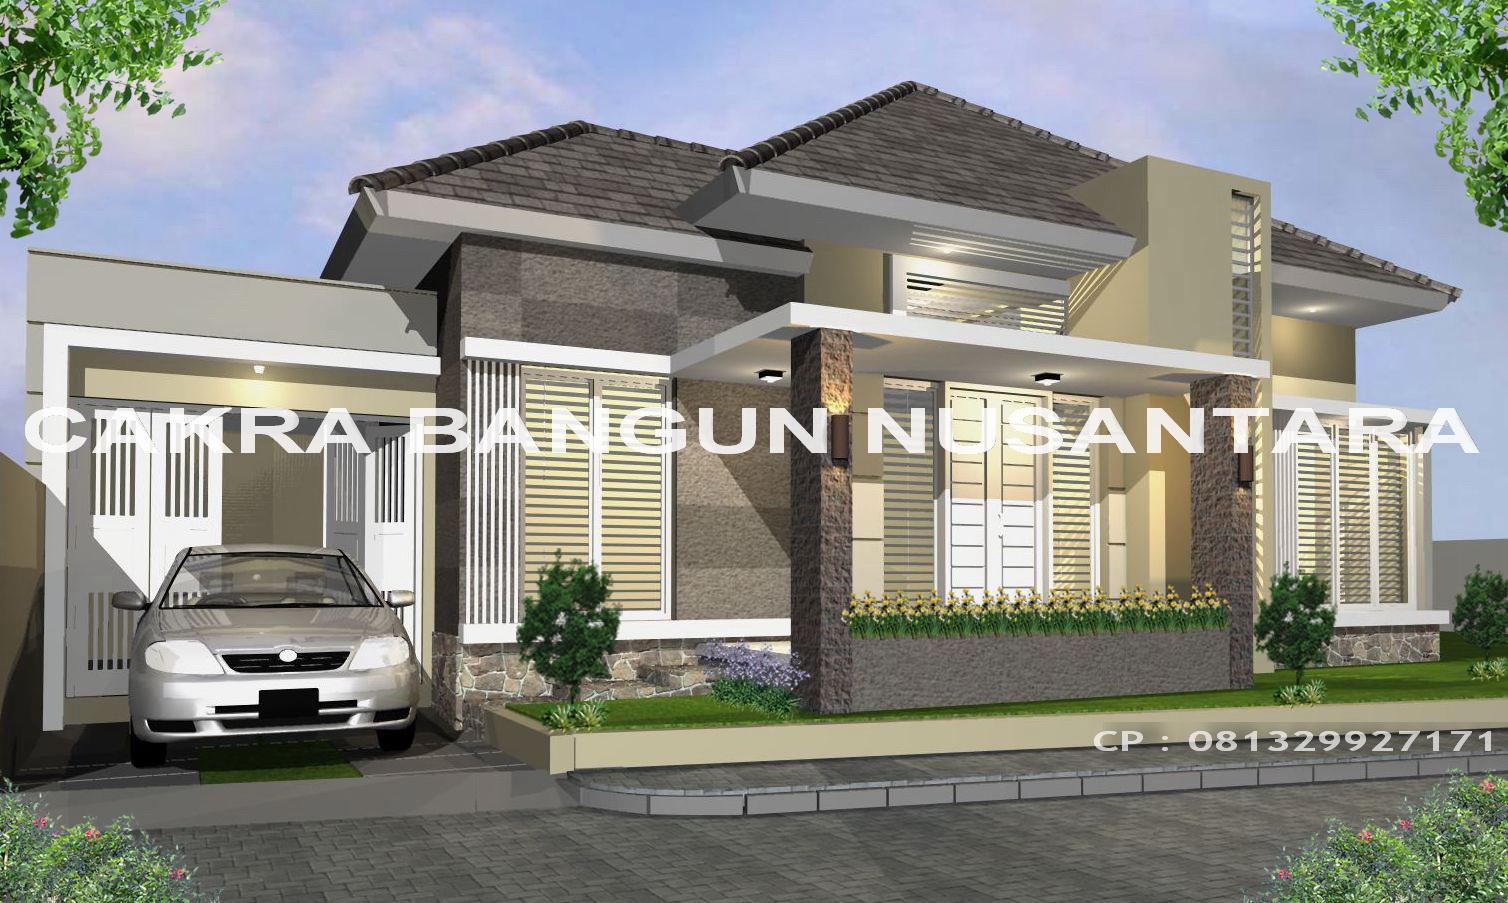 Bangun Rumah Yogyakarta Bersama Cakra Bangun Nusantara Arsitek